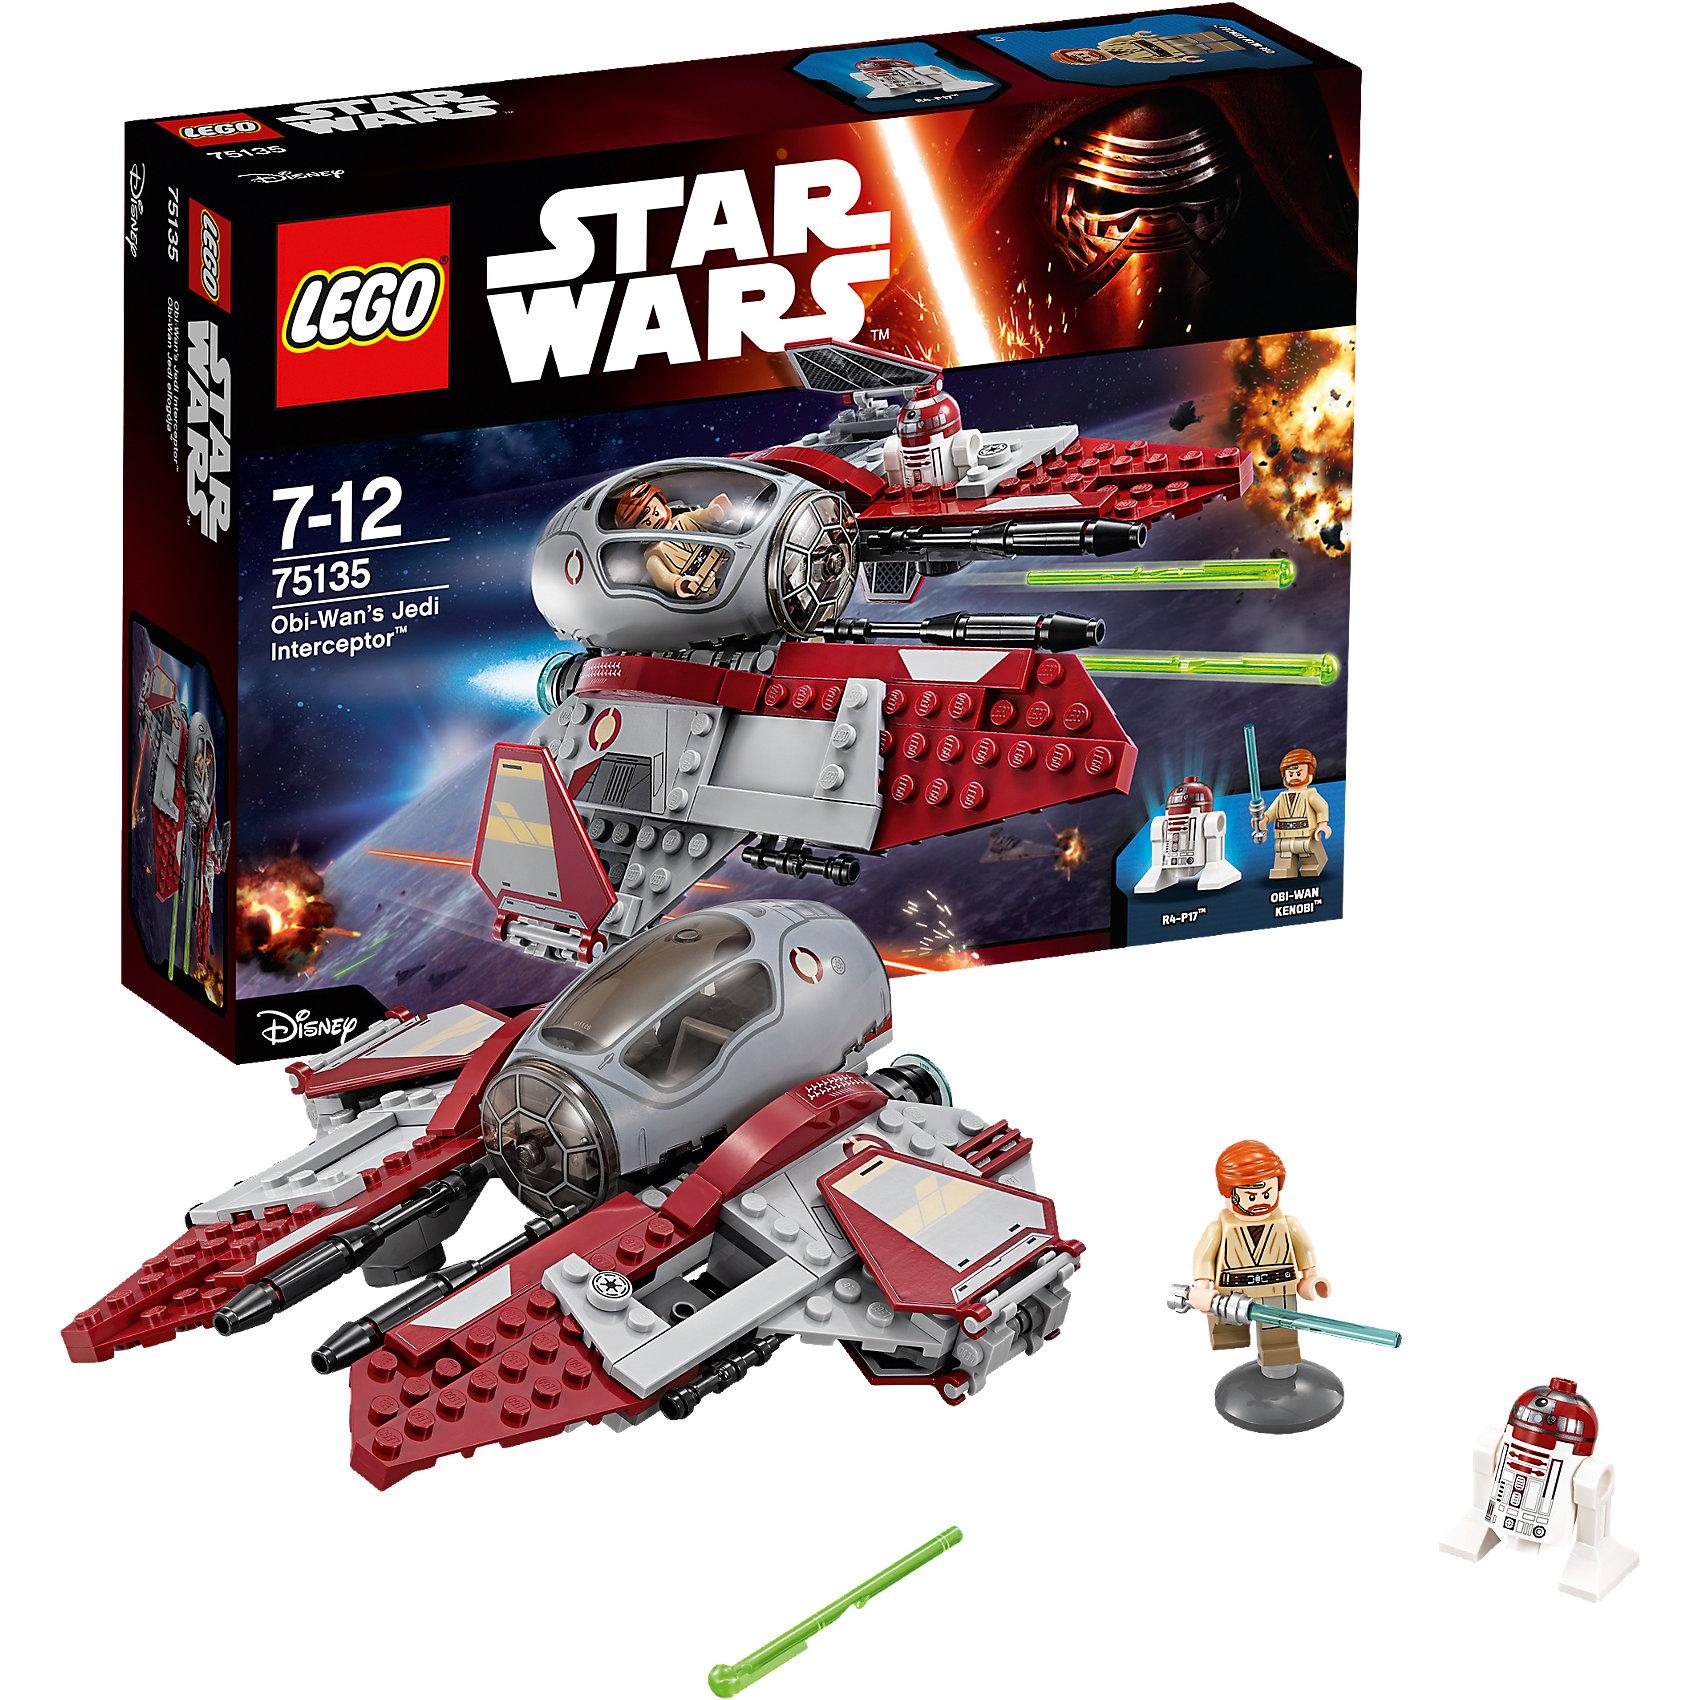 LEGO LEGO Star Wars 75135: Перехватчик джедаев Оби-Вана Кеноби™